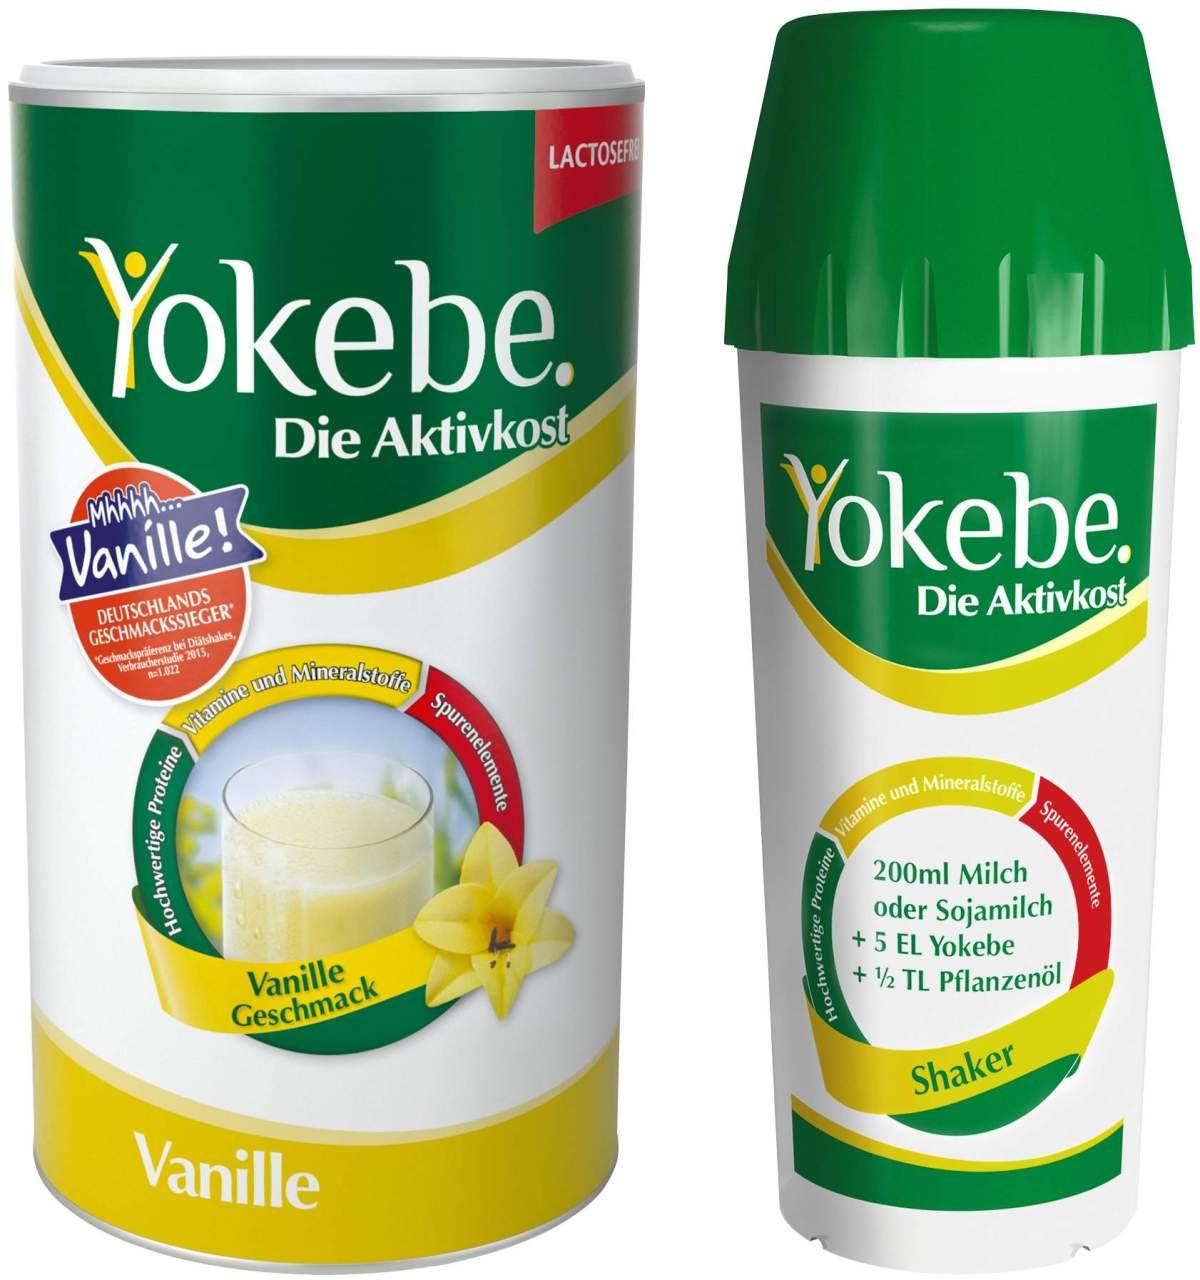 Yokebe Lactosefrei Vanille mit Shaker 500 g Pulver